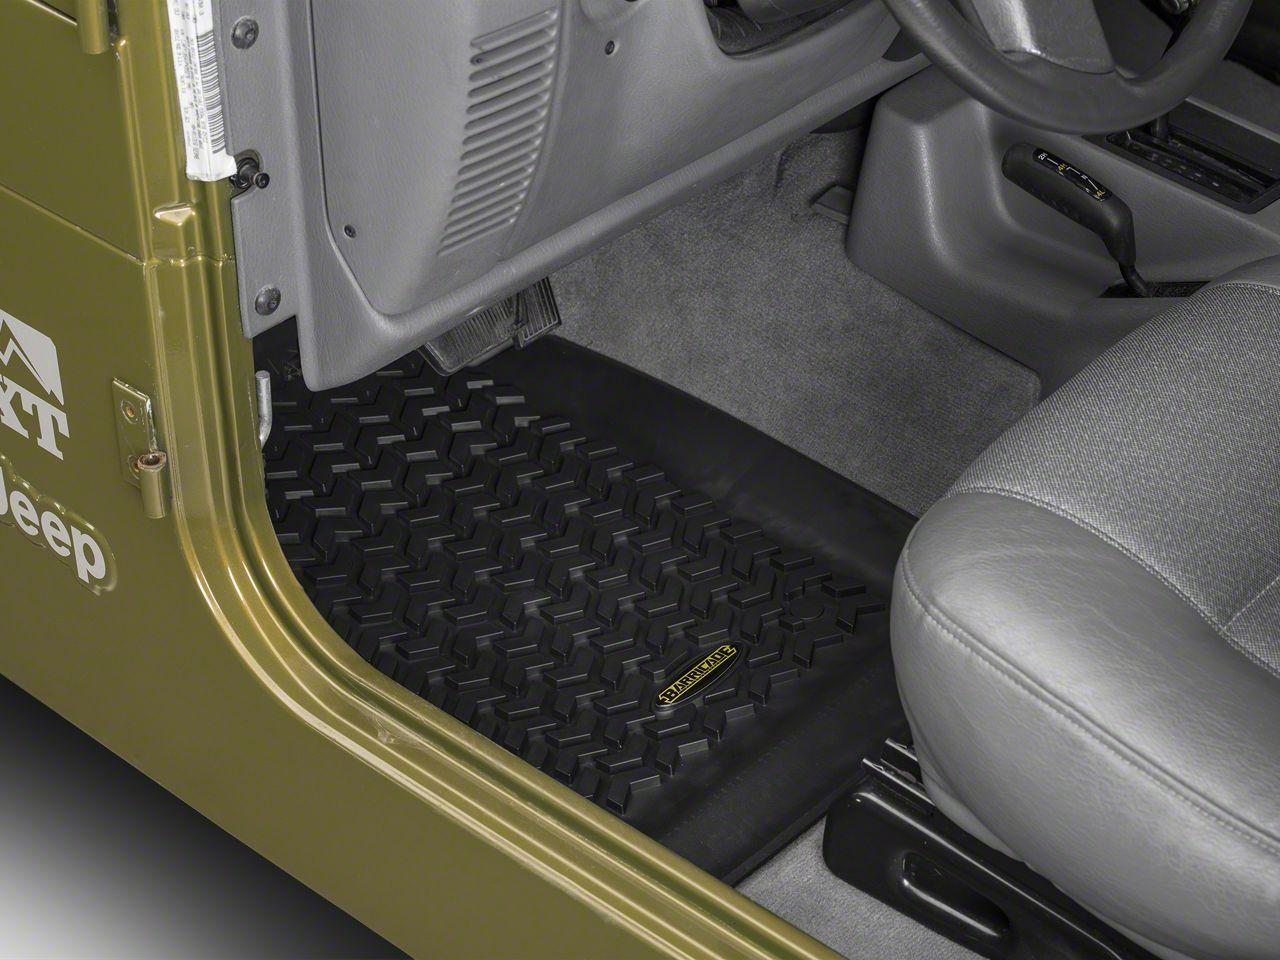 Barricade Front & Rear Floor Mats - Black (97-06 Jeep Wrangler TJ)